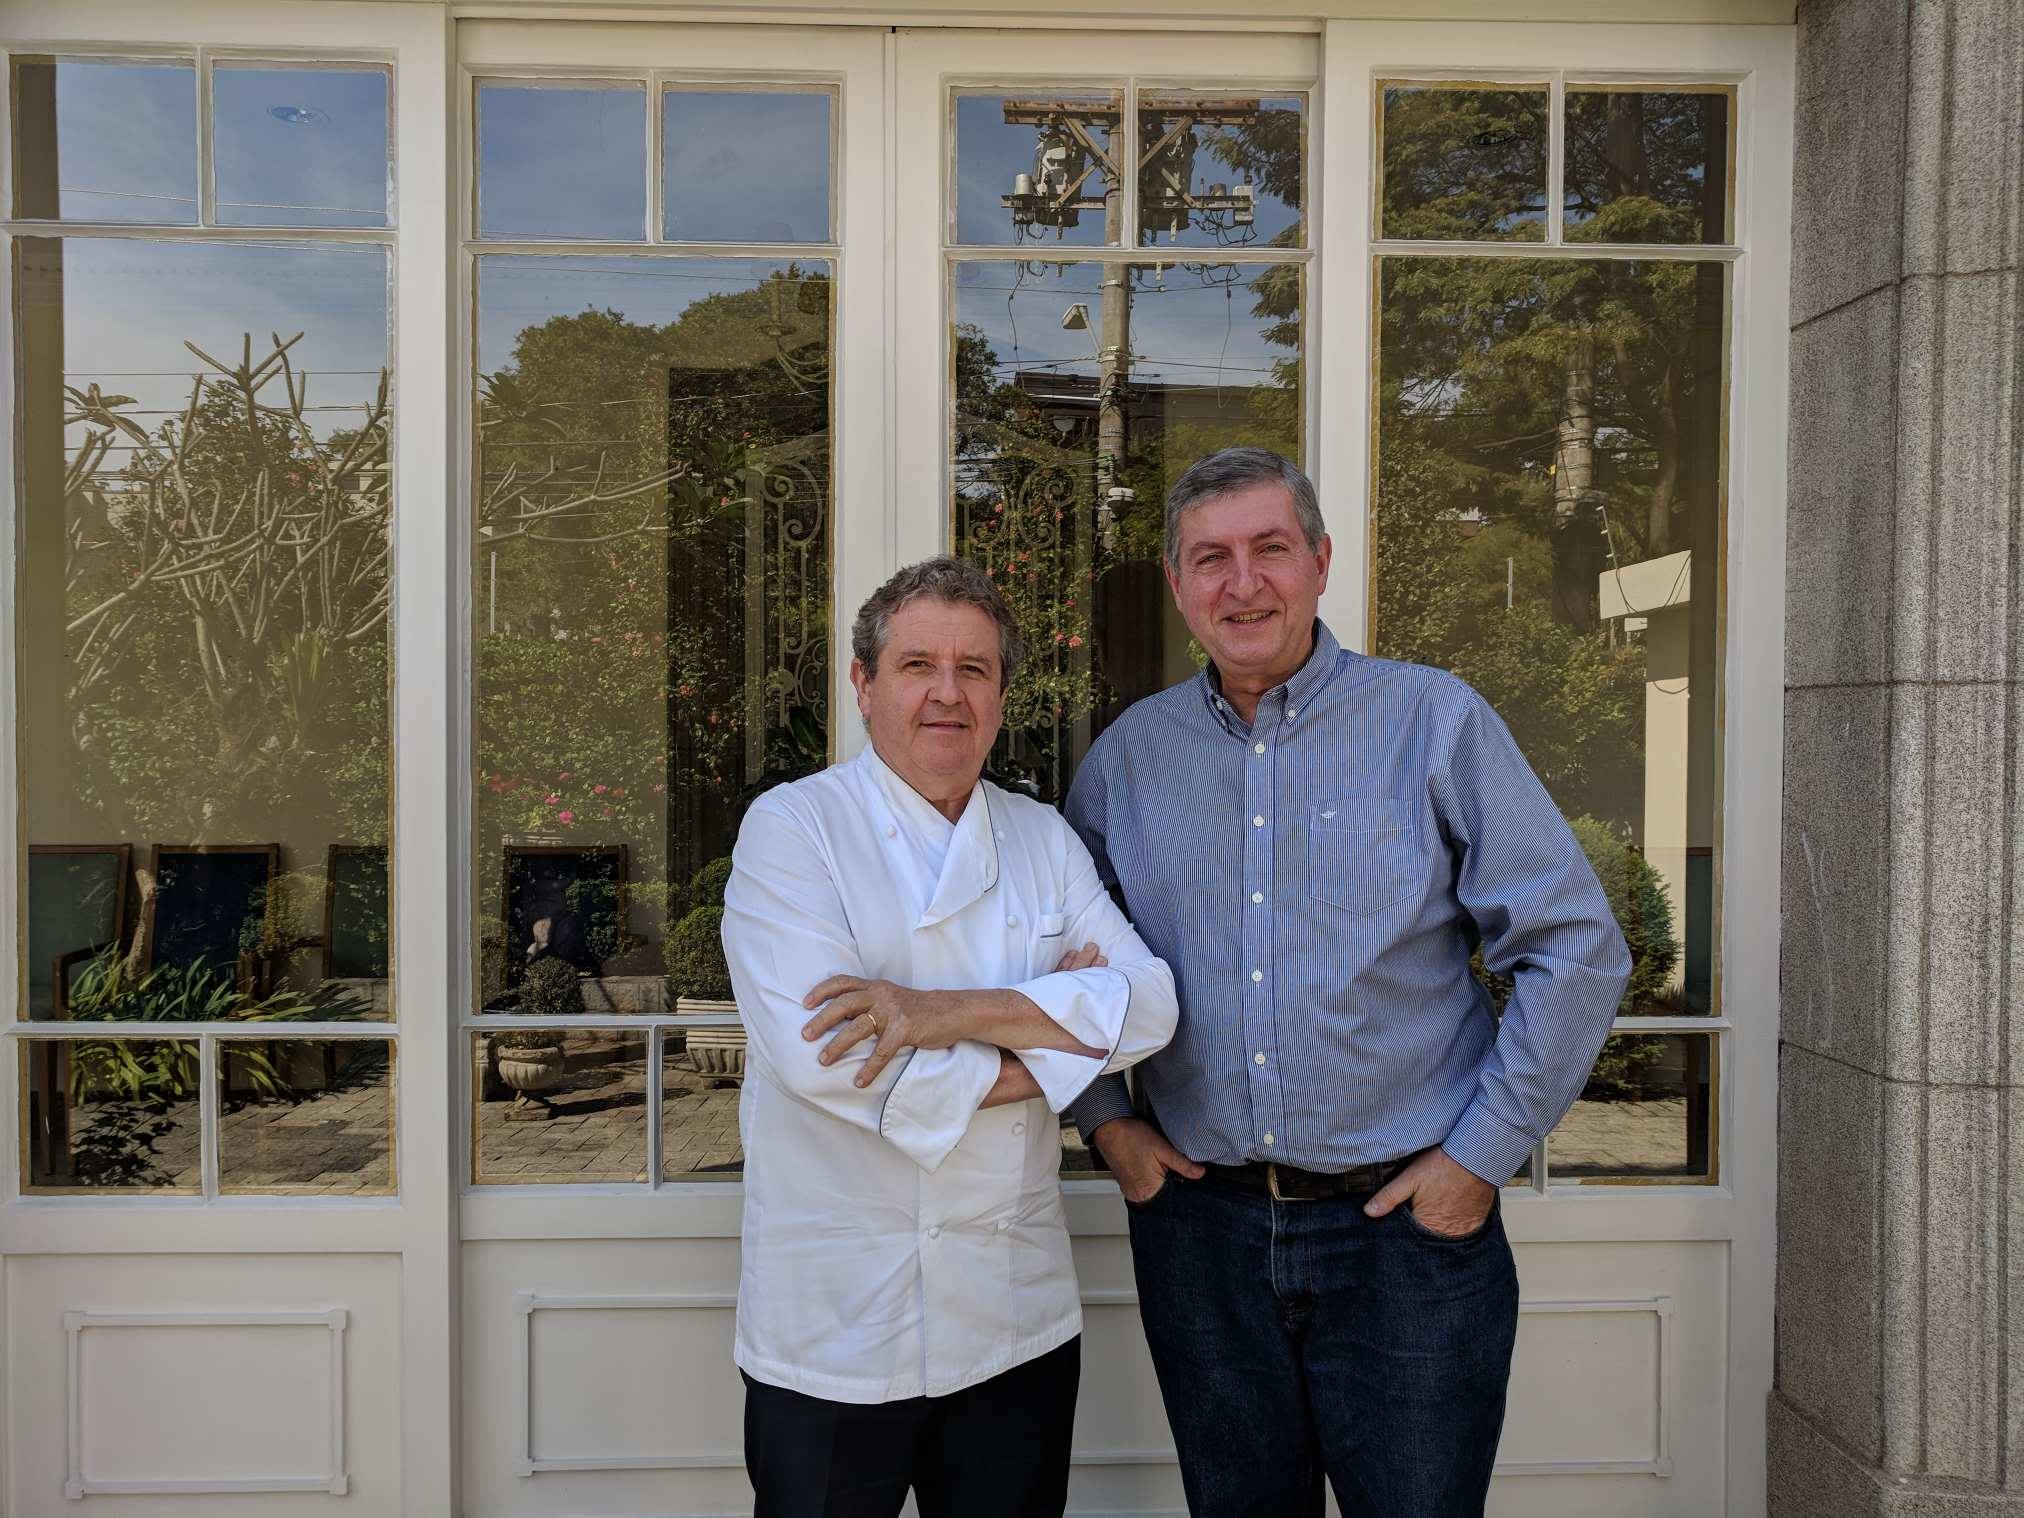 jornalista_paulo_panayotis_e_chef_laurent_suaudeau